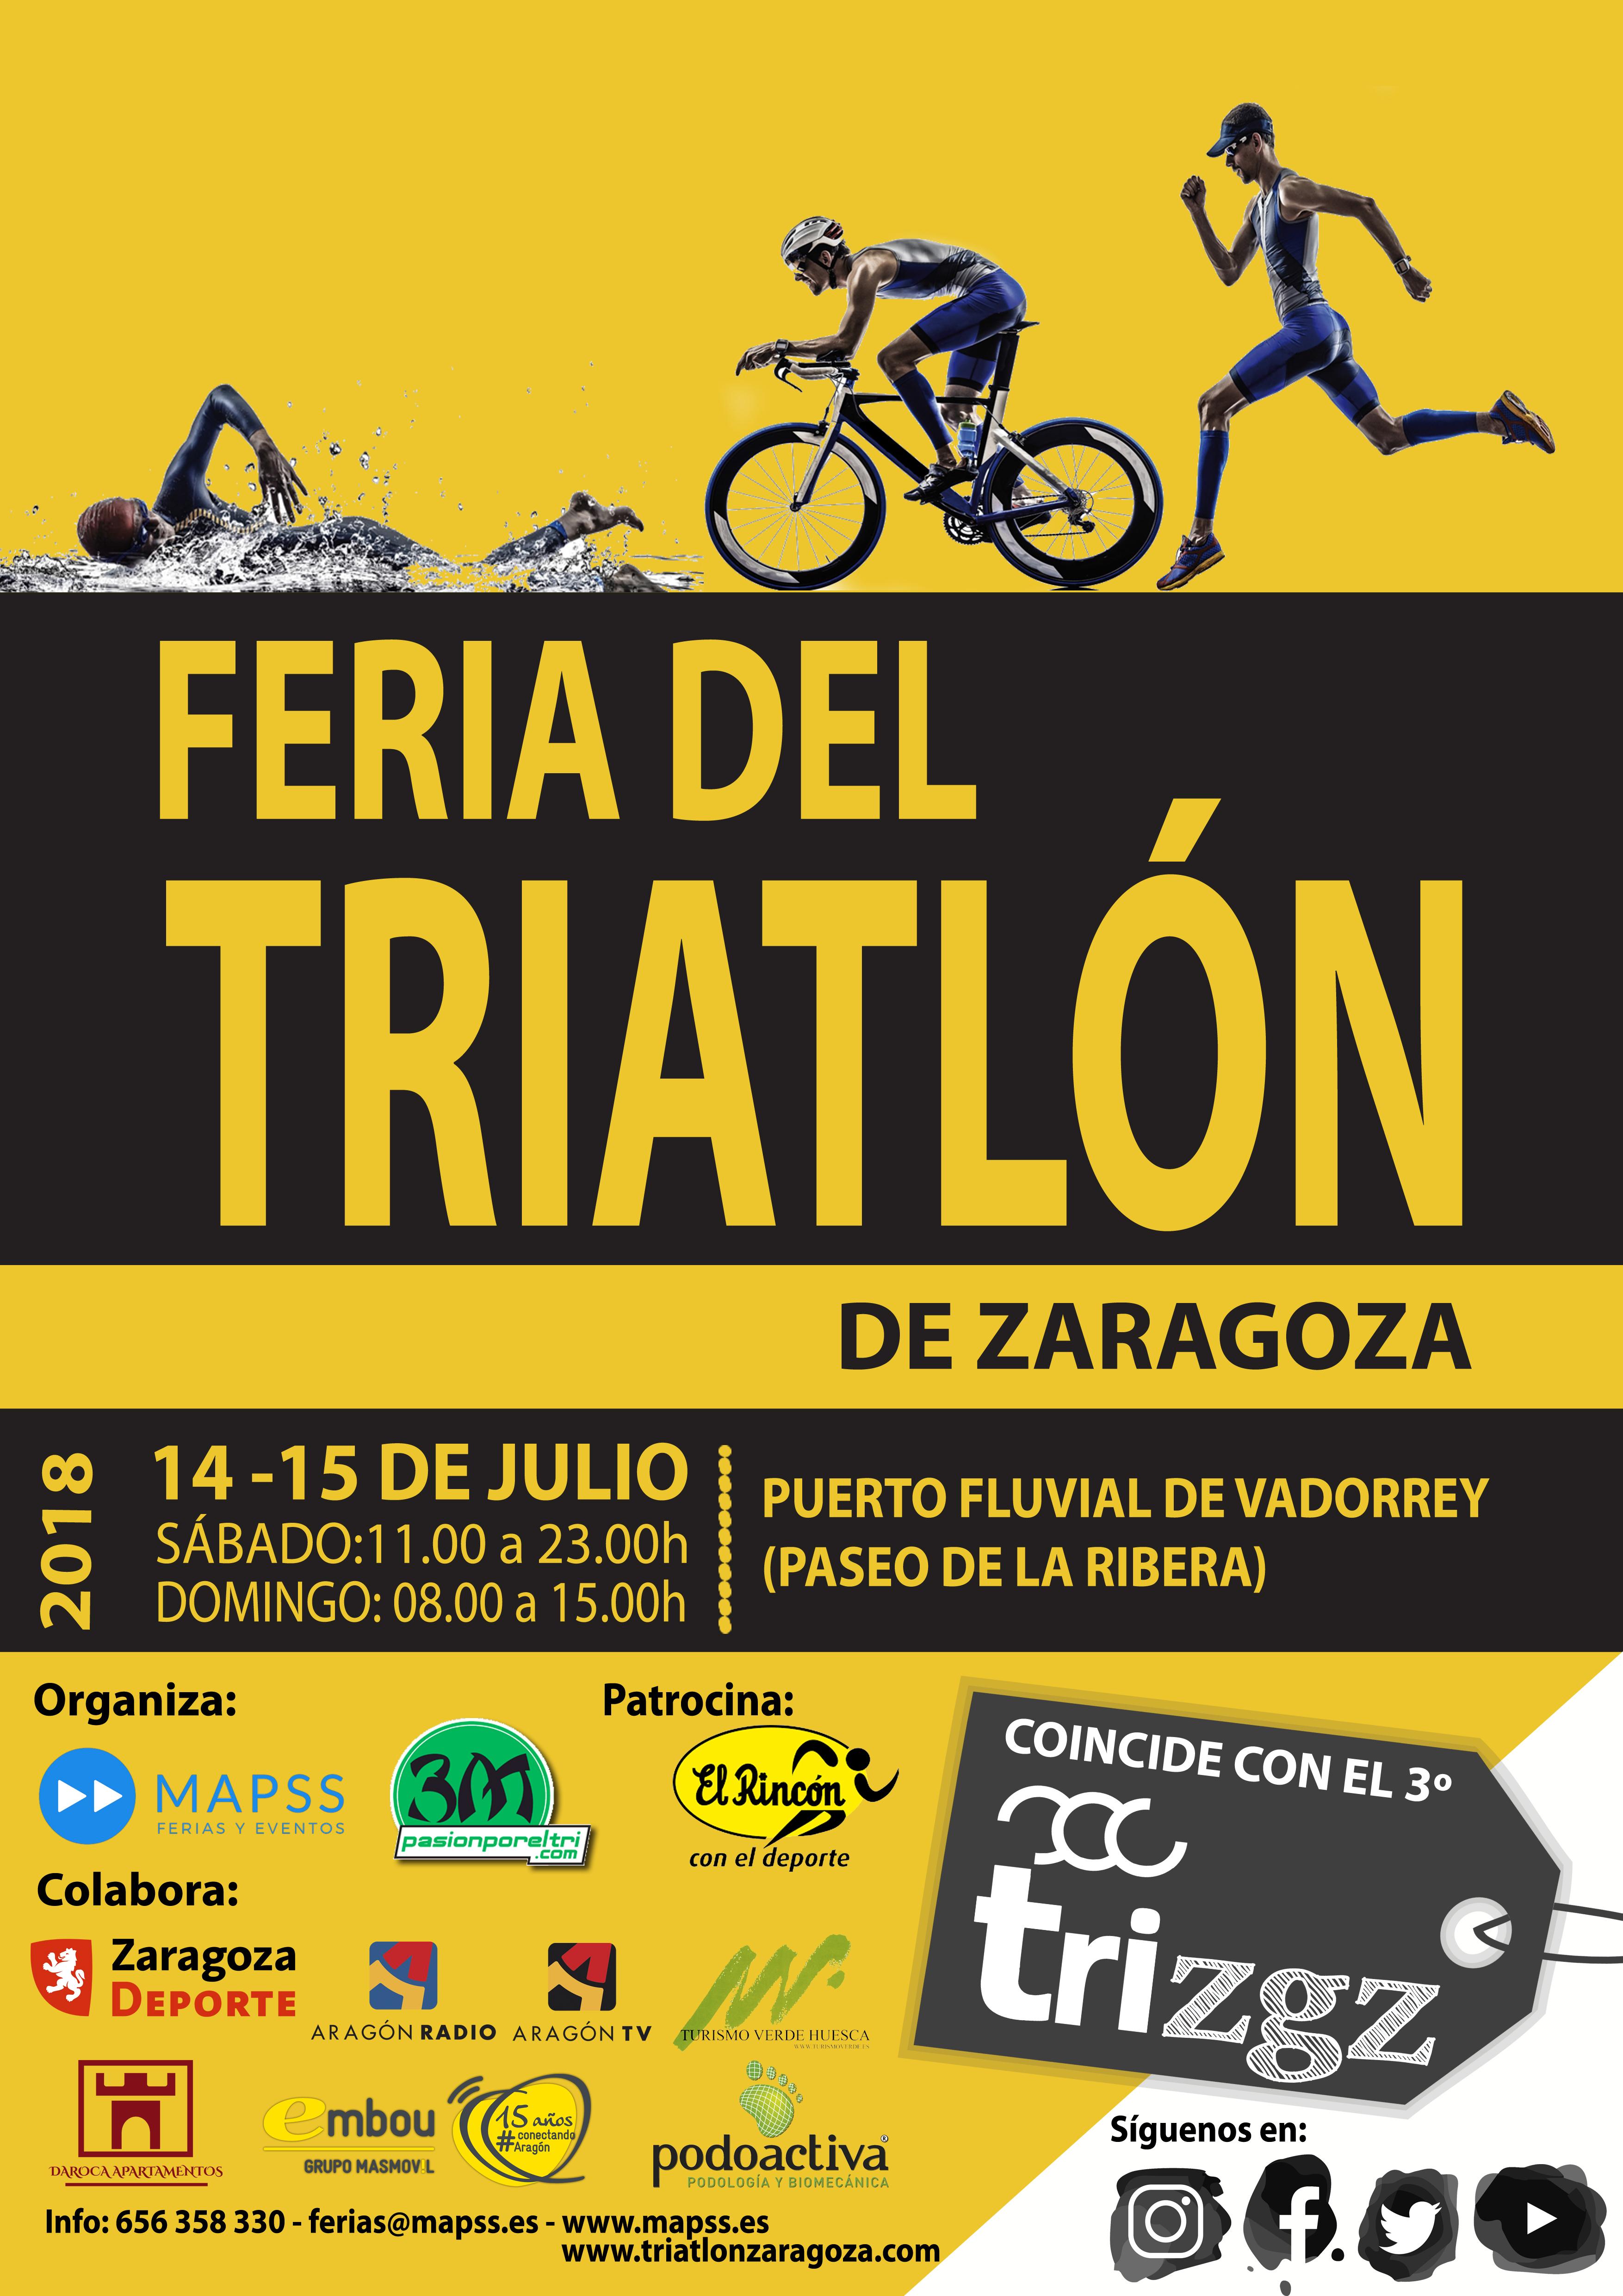 Feria del Triatlón de Zaragoza